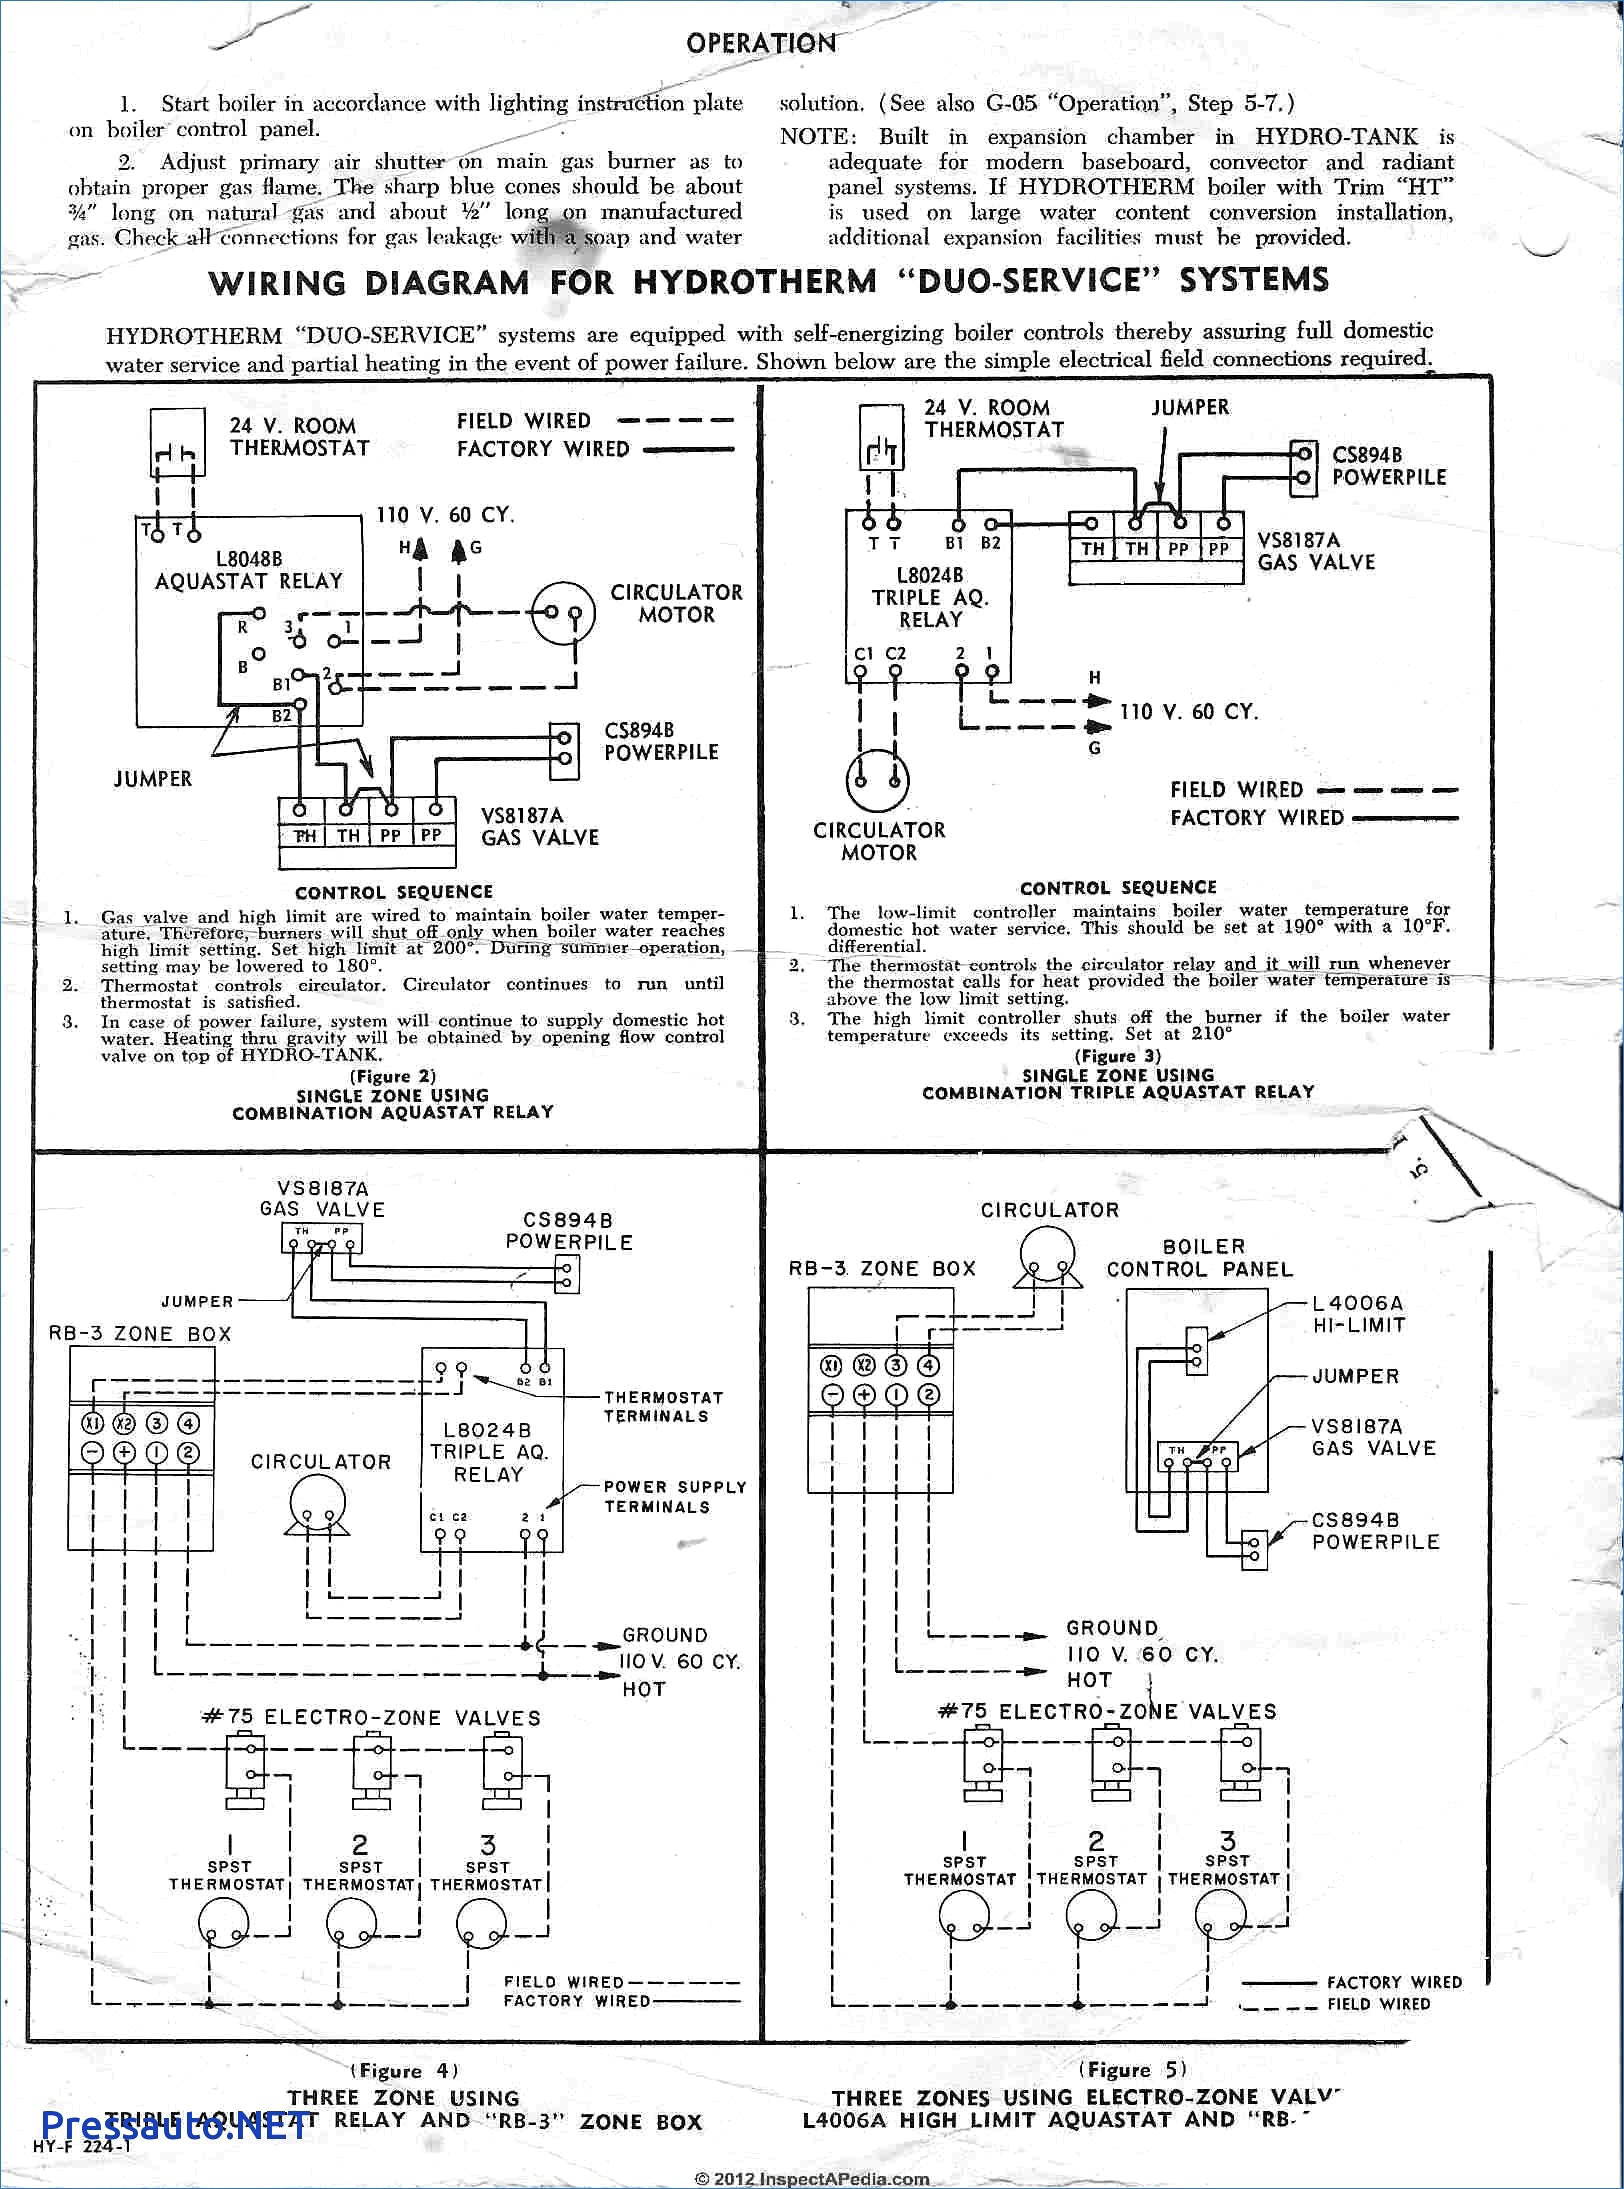 White Rodgers Wiring Diagram Advanced - Alternator Wiring Diagram External  Regulator - ezgobattery.yenpancane.jeanjaures37.fr | White Rodgers Wiring Diagram Advanced |  | Wiring Diagram Resource